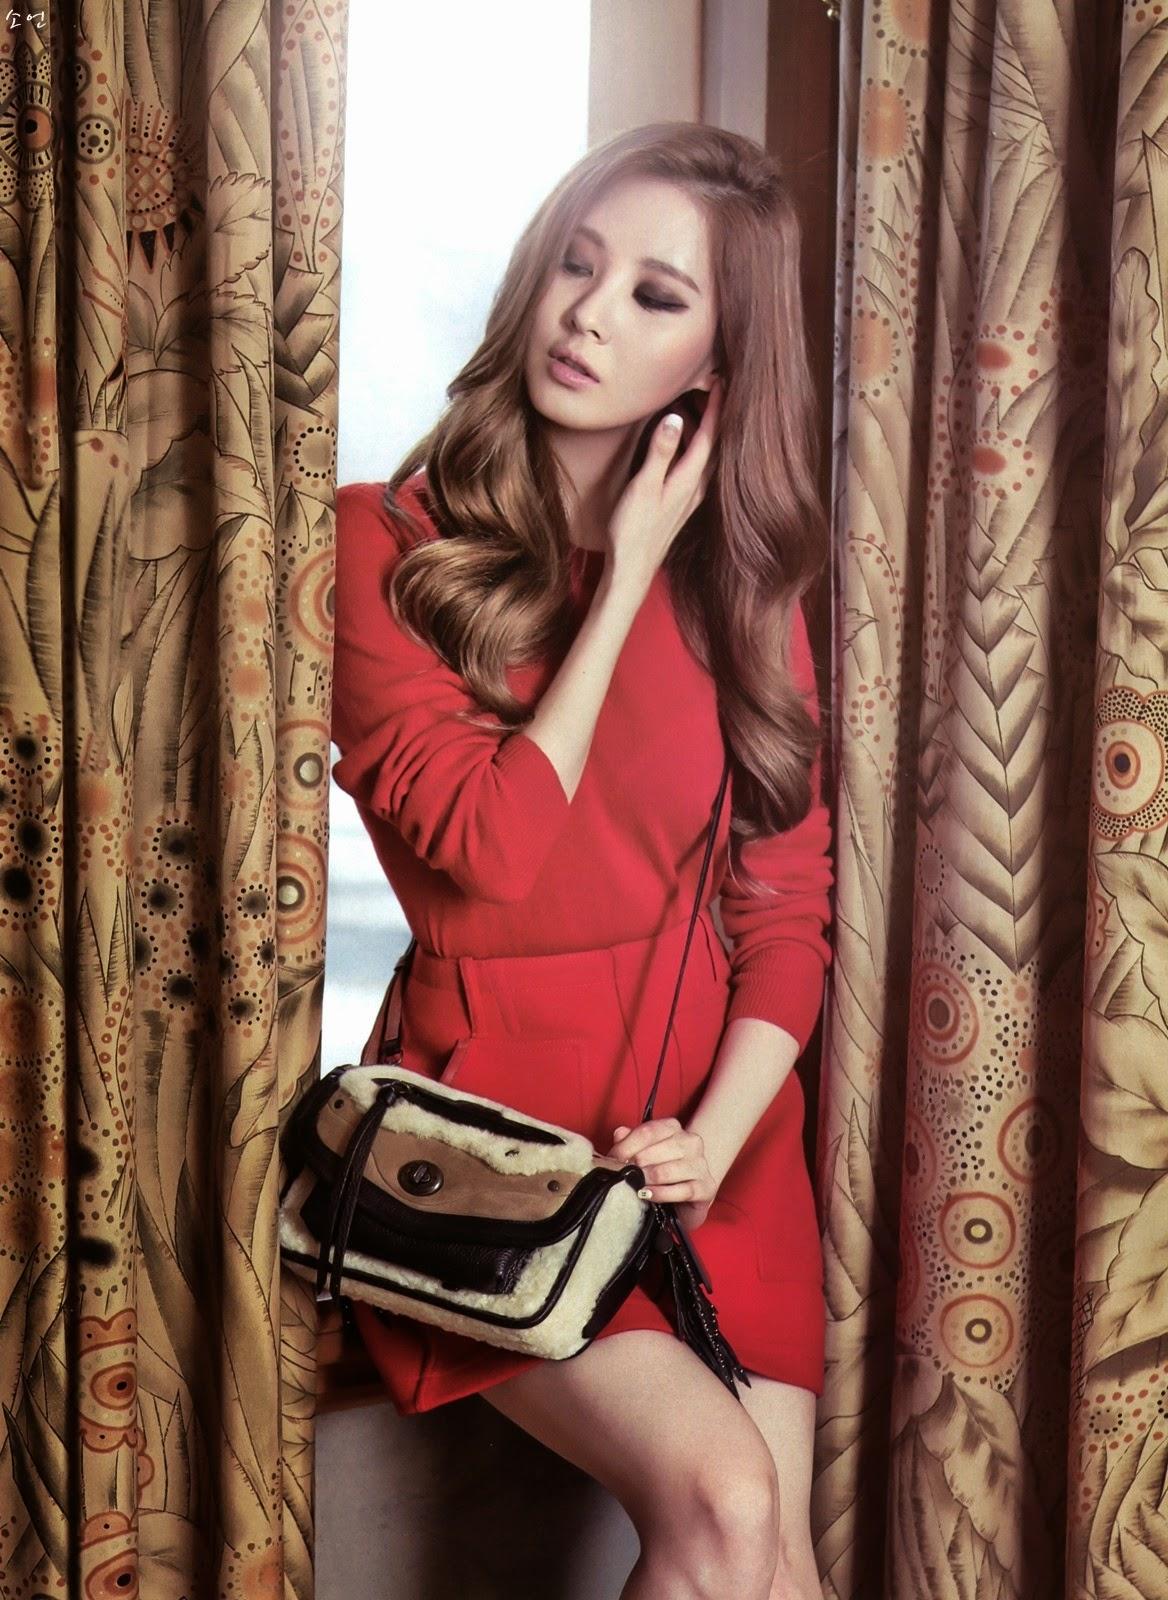 Snsd Seohyun Airport Fashion: [Pictures] 140821 SNSD Seohyun